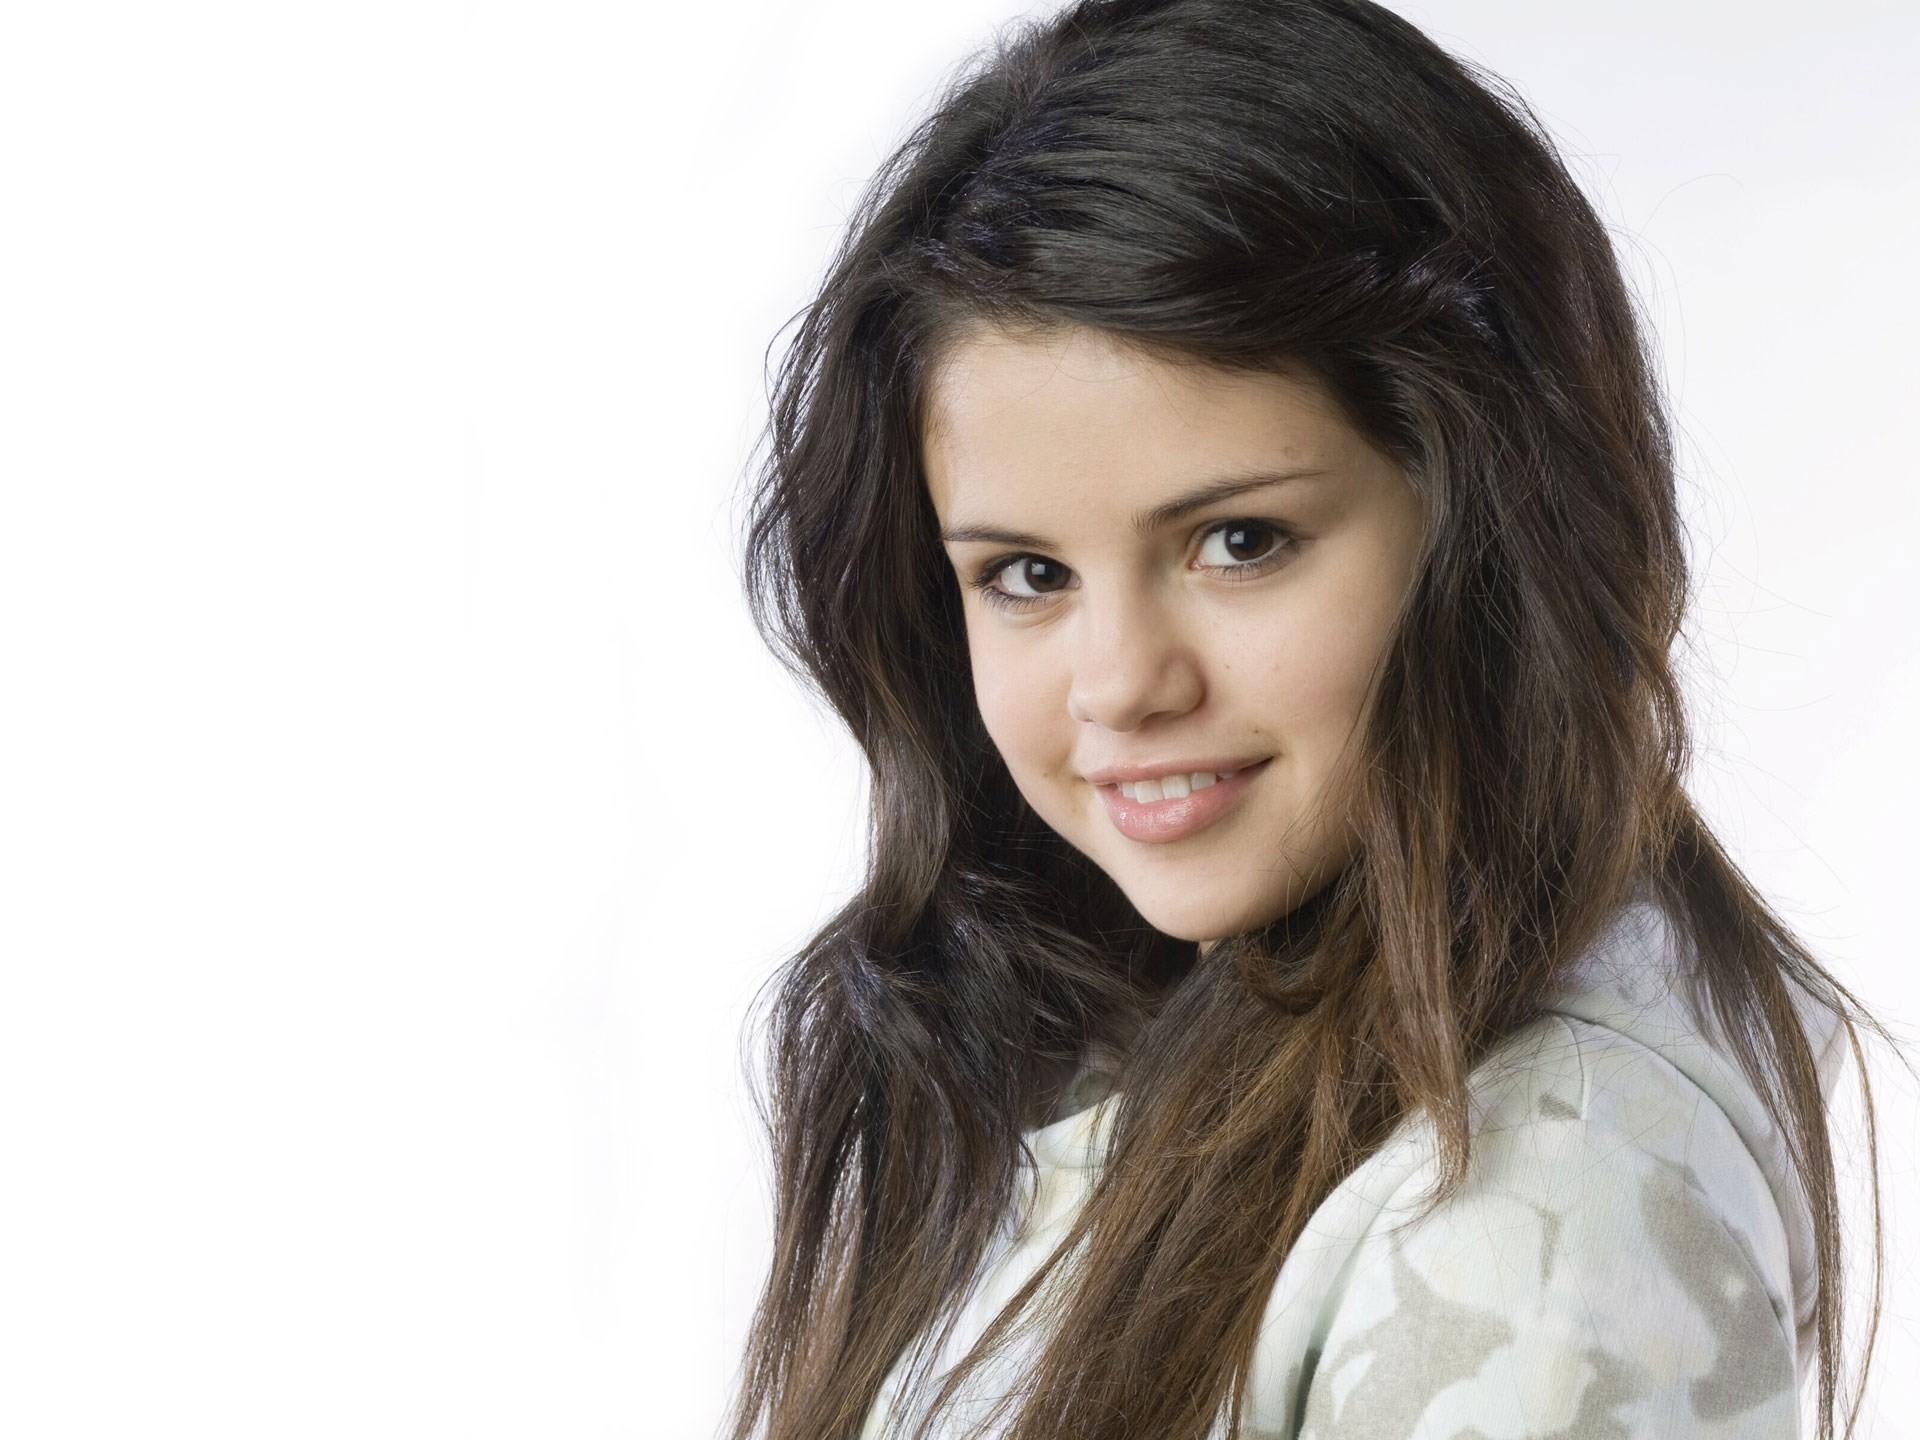 Selena Gomez iPhone Wallpaper 80 images